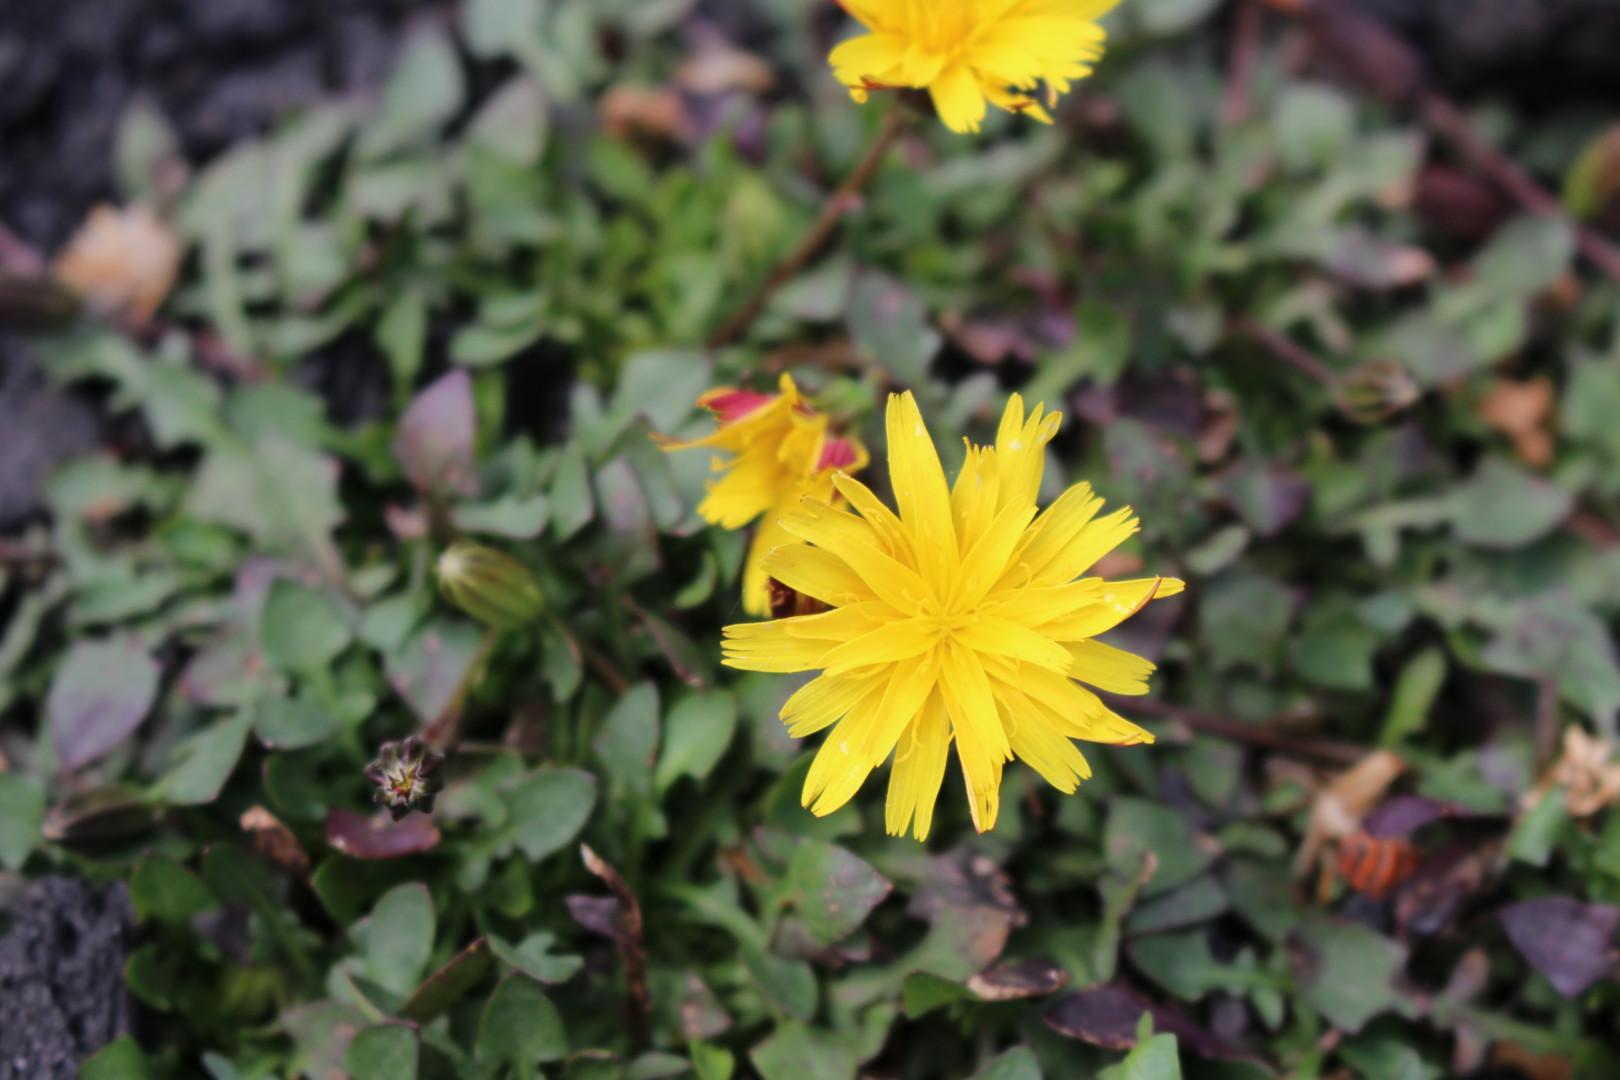 Robertia taraxacoides